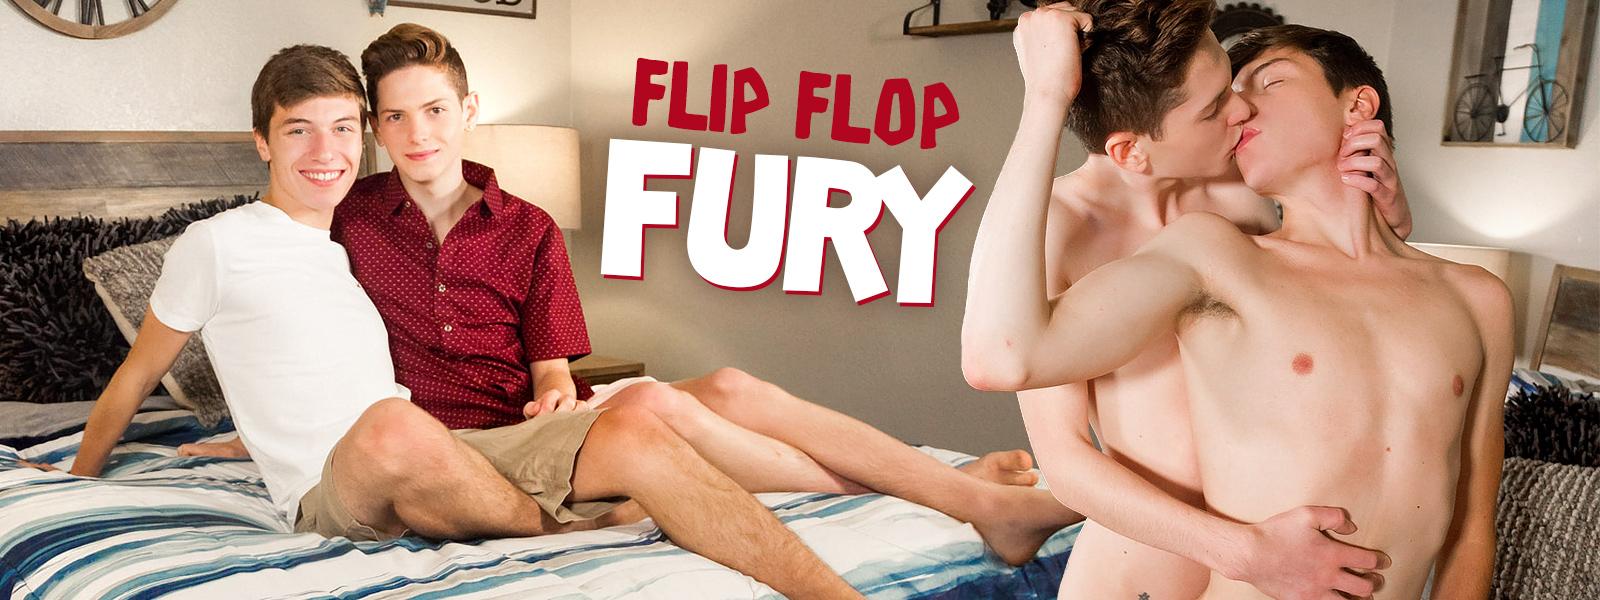 Flip Flop Fury